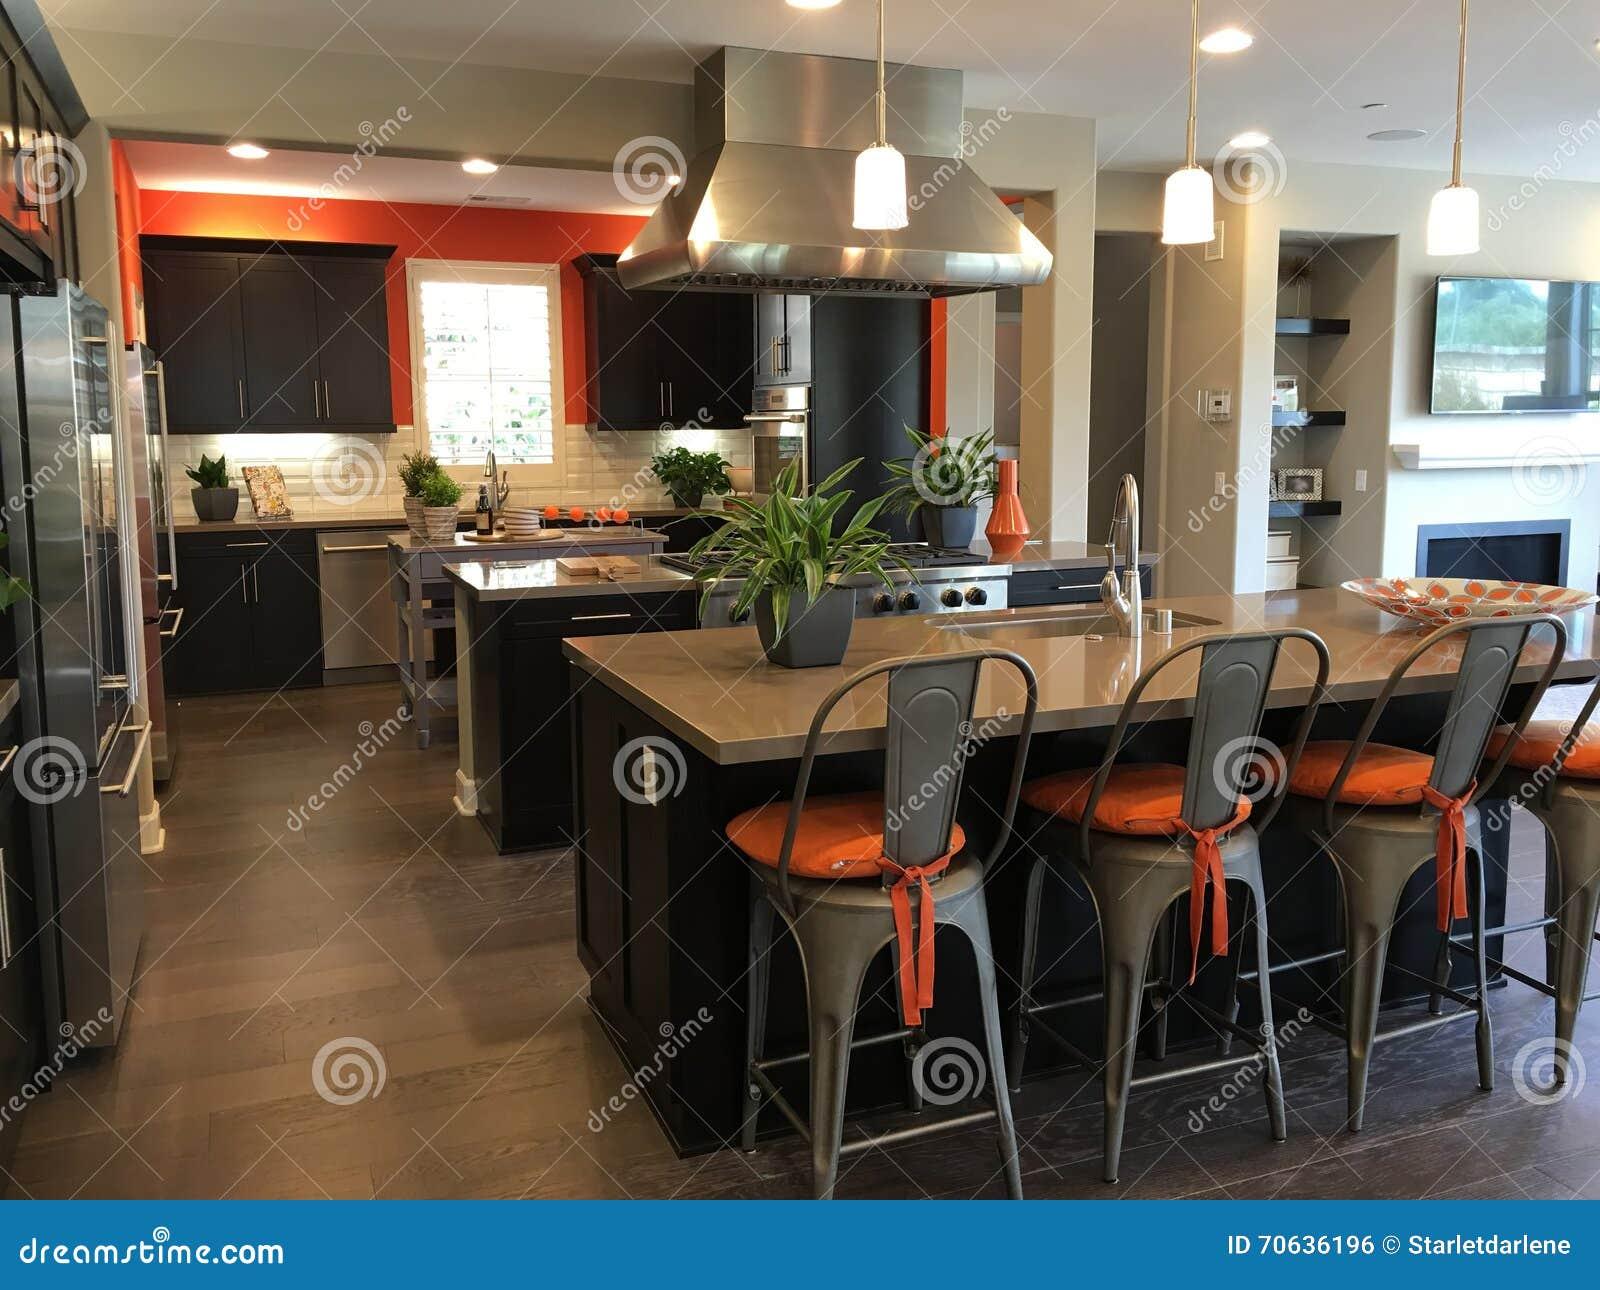 Orange walls kitchen couchable co